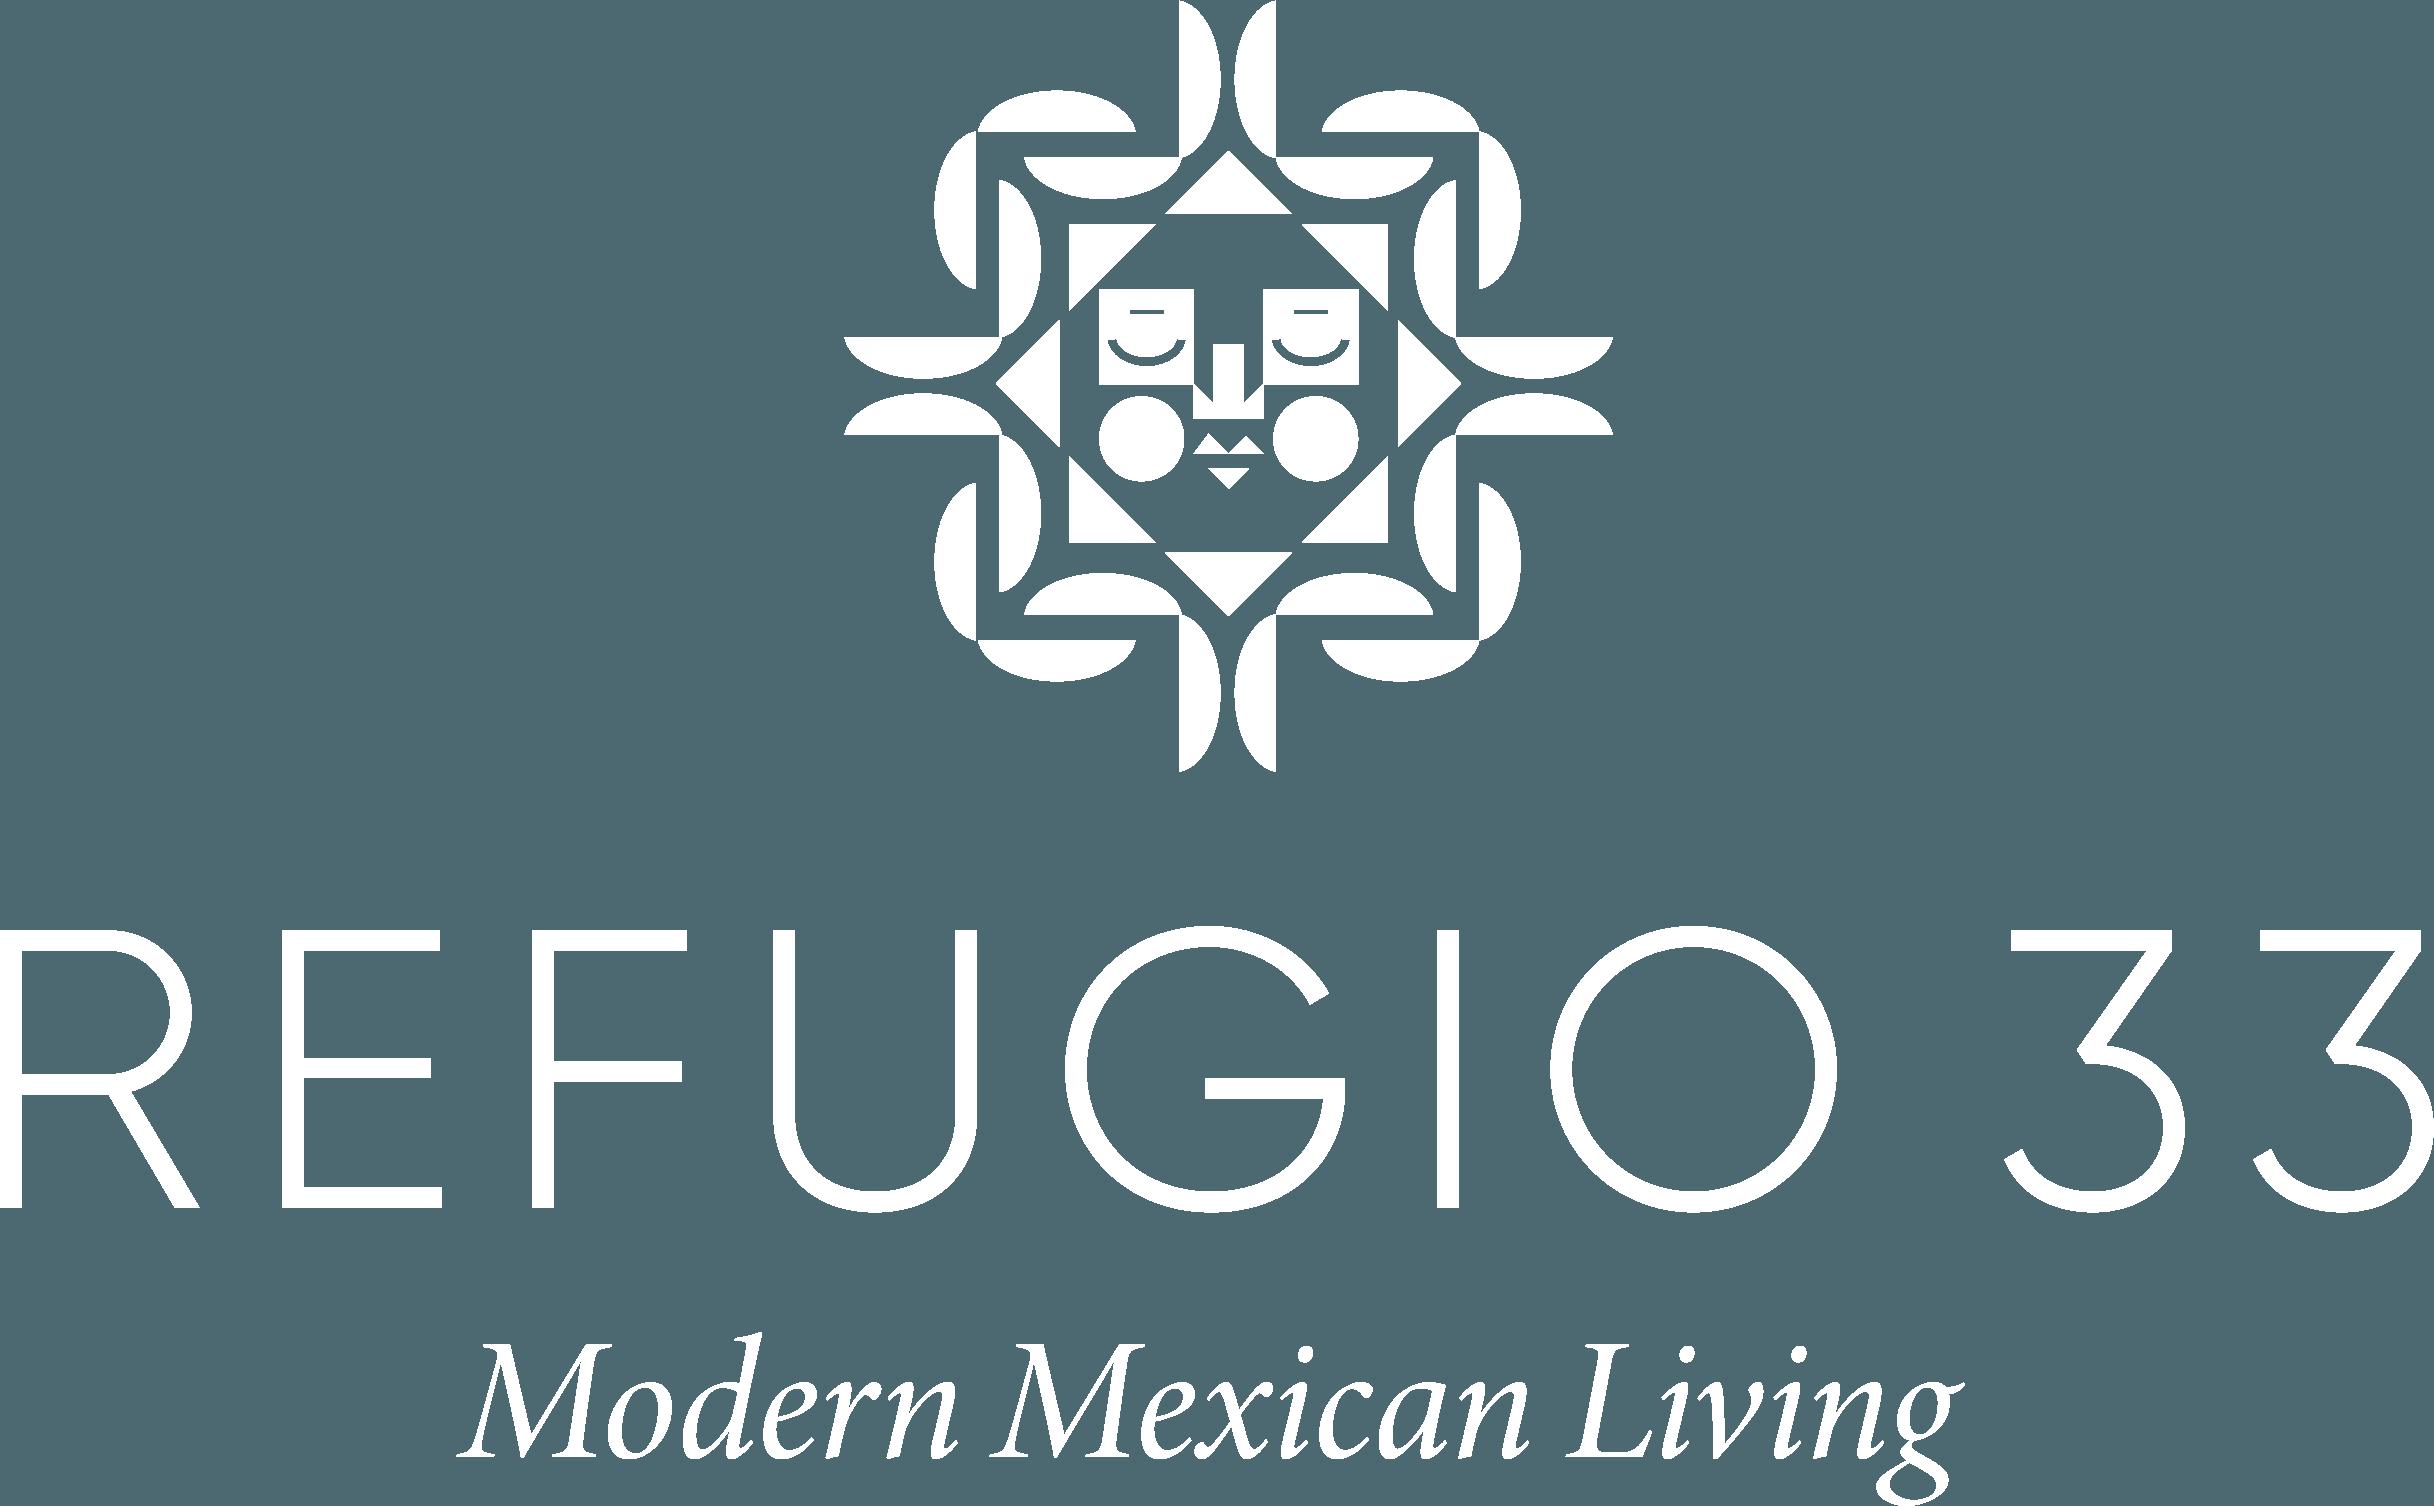 Modern Mexican Living